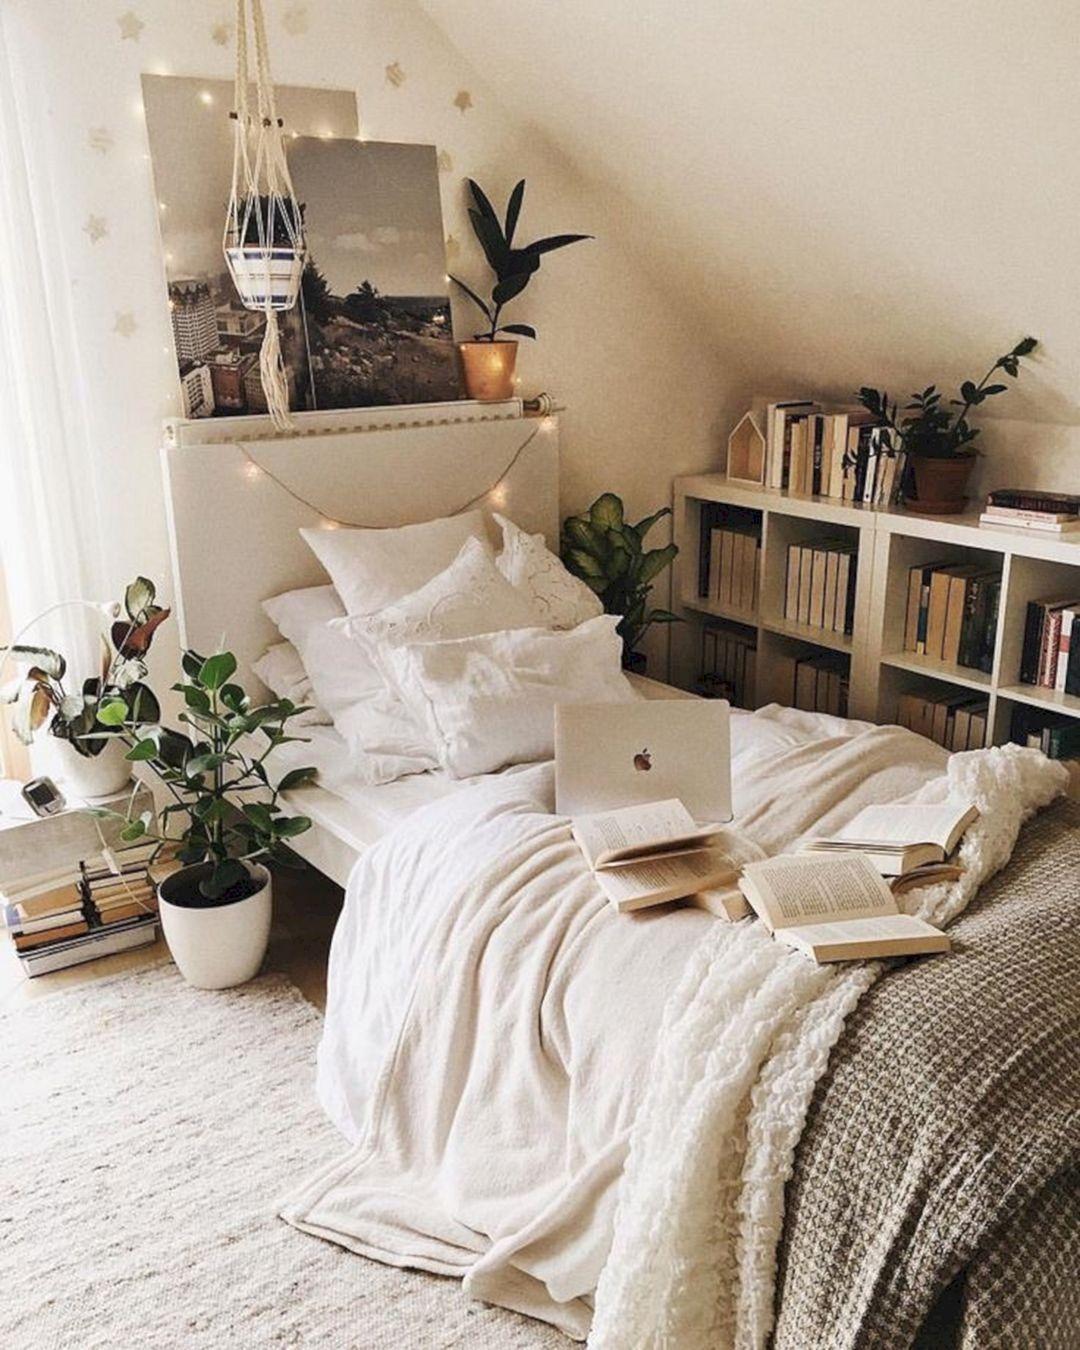 14 Super Cozy Bedroom Decoration Ideas For Best Inspiration Dexorate Cozy Small Bedrooms Small Room Bedroom Bedroom Decor